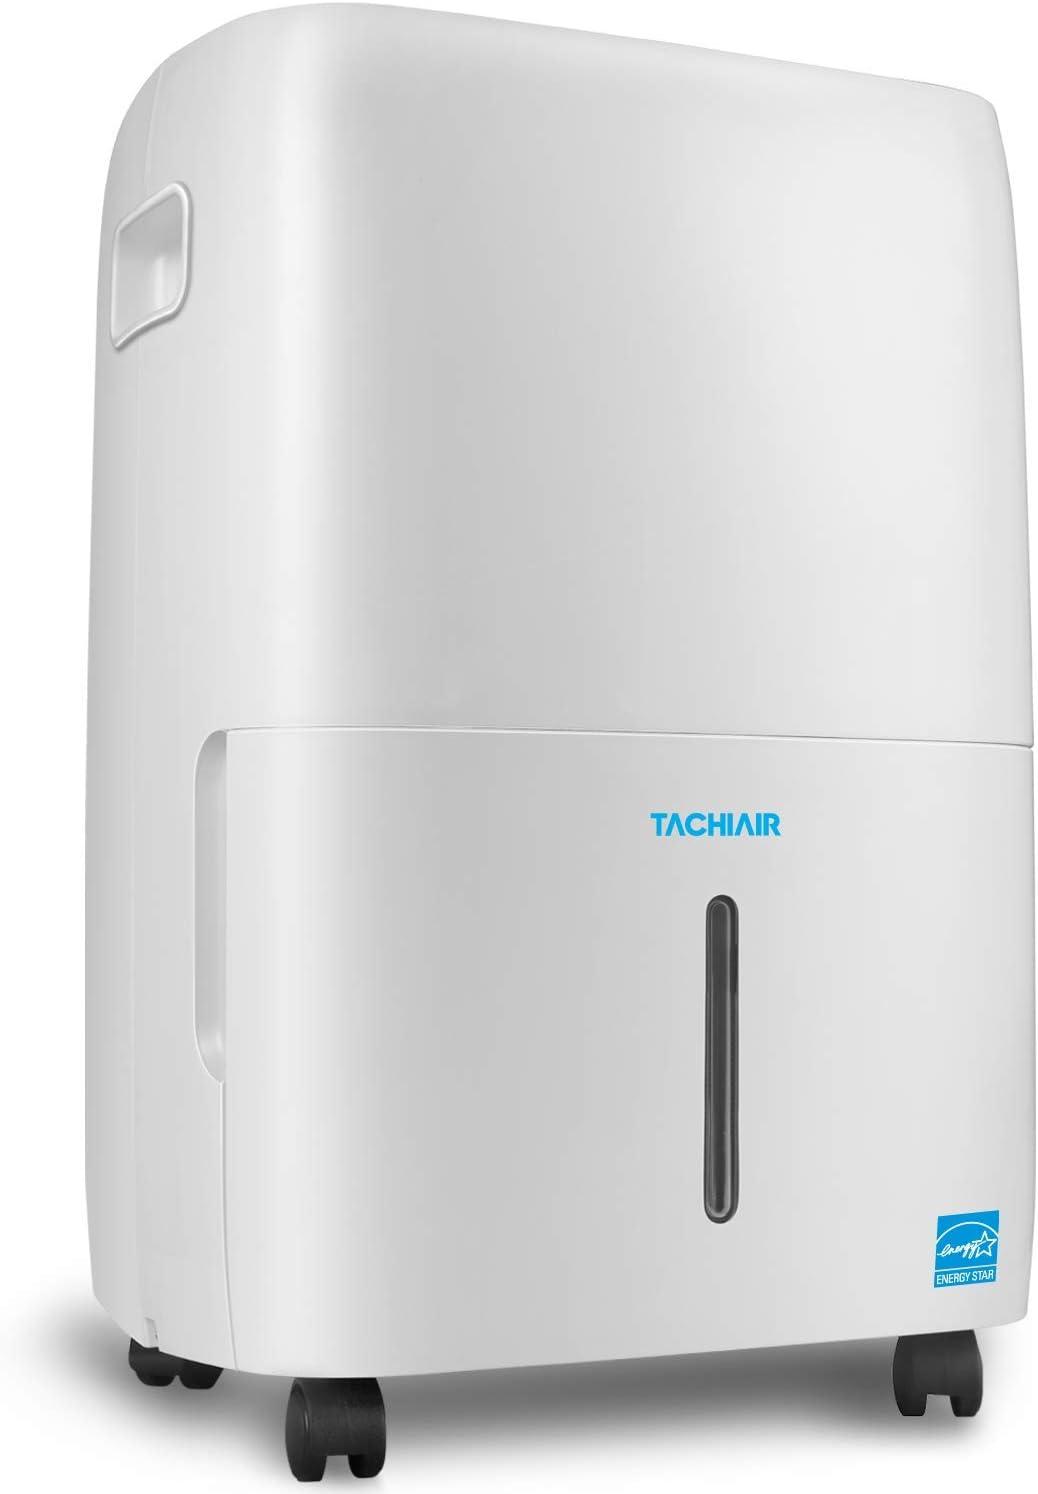 TACHIAIR Dehumidifier for Basements, 70-pint Energy Star Portable Dehumidifier, Intelligent Humidity Control, Auto Shutoff/Restart, 3 Fan Speeds Optional and Easy Roll Wheels(50 pint New DOE)